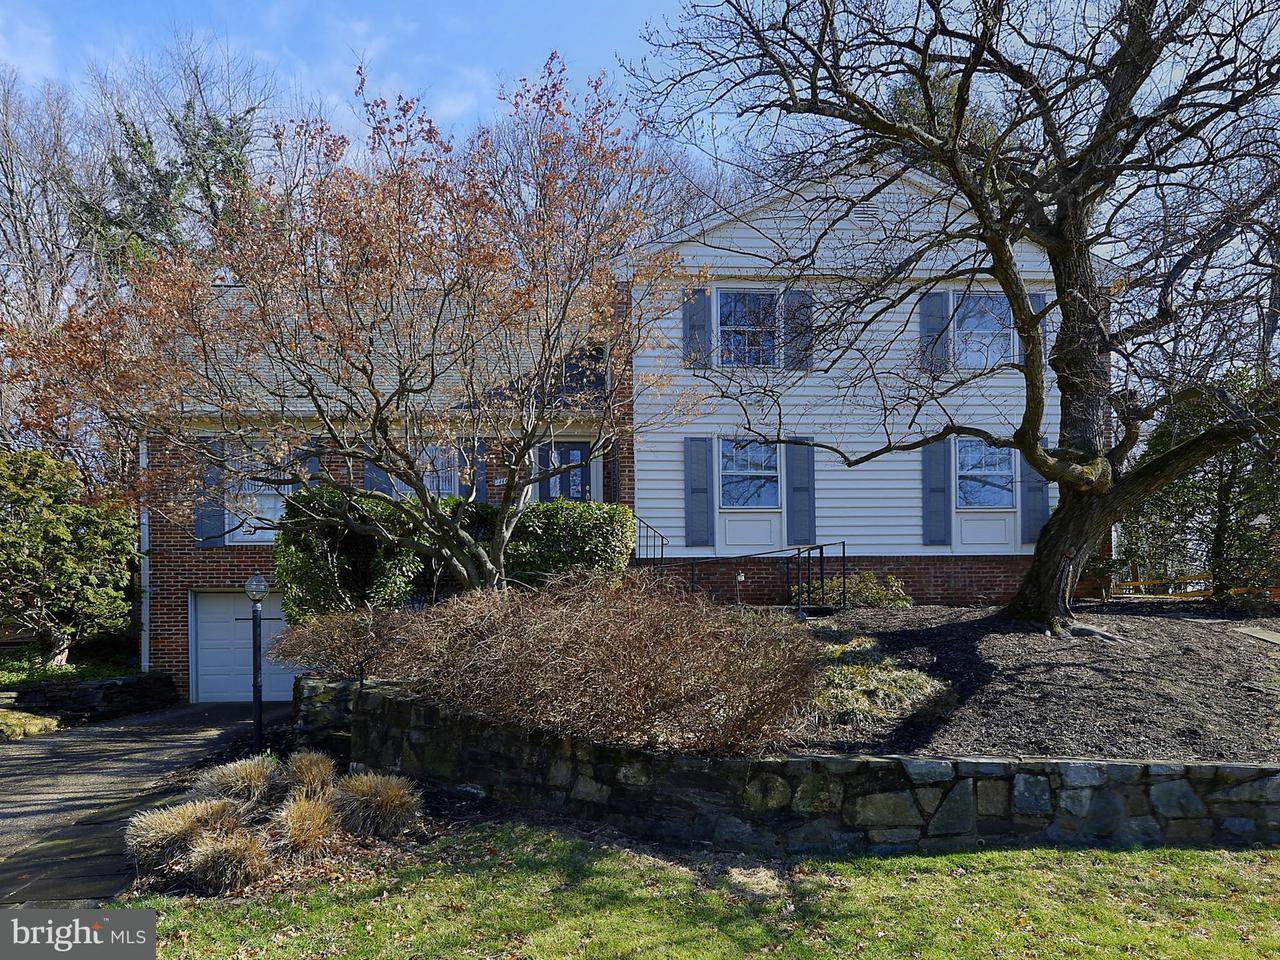 Single Family Home for Sale at 11611 Magruder Lane 11611 Magruder Lane Rockville, Maryland 20852 United States